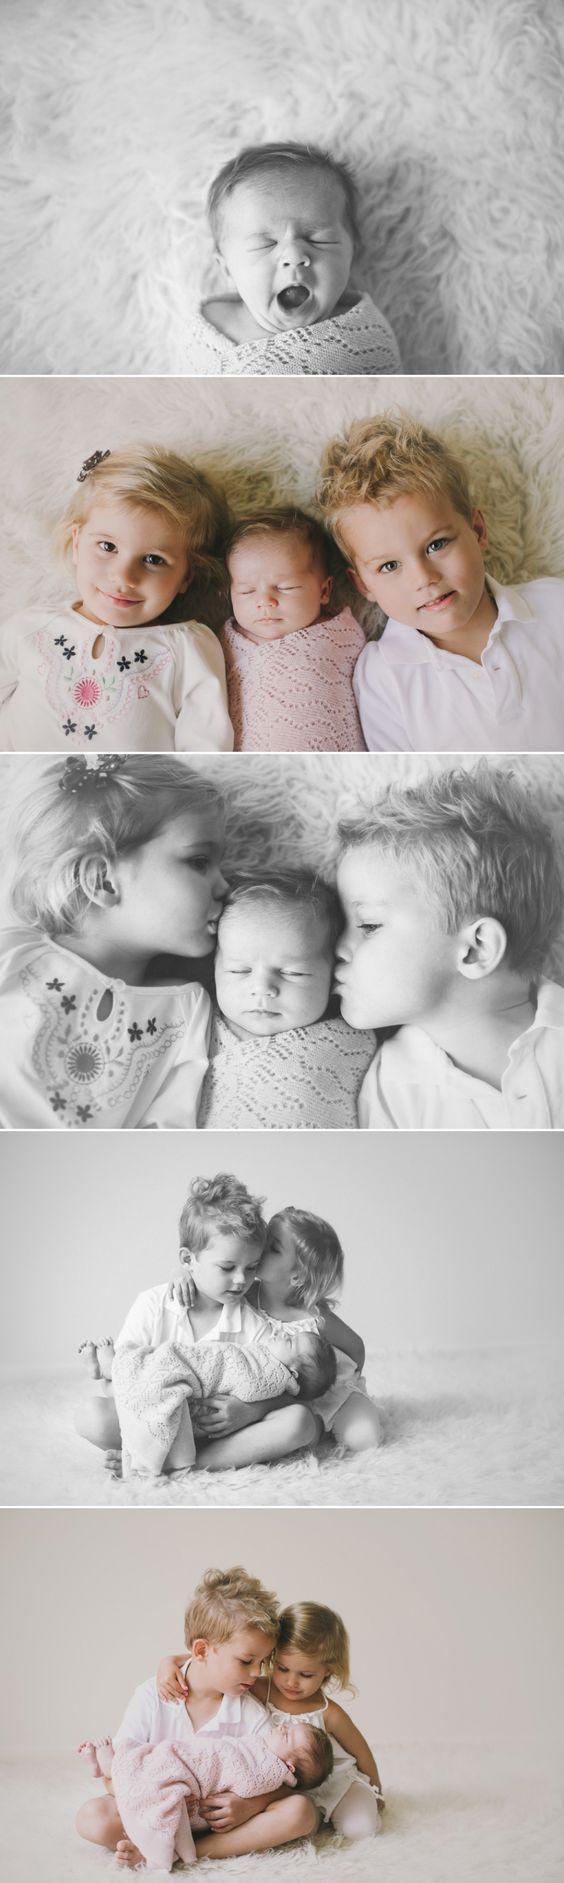 fantastic sibling shots with newborn!